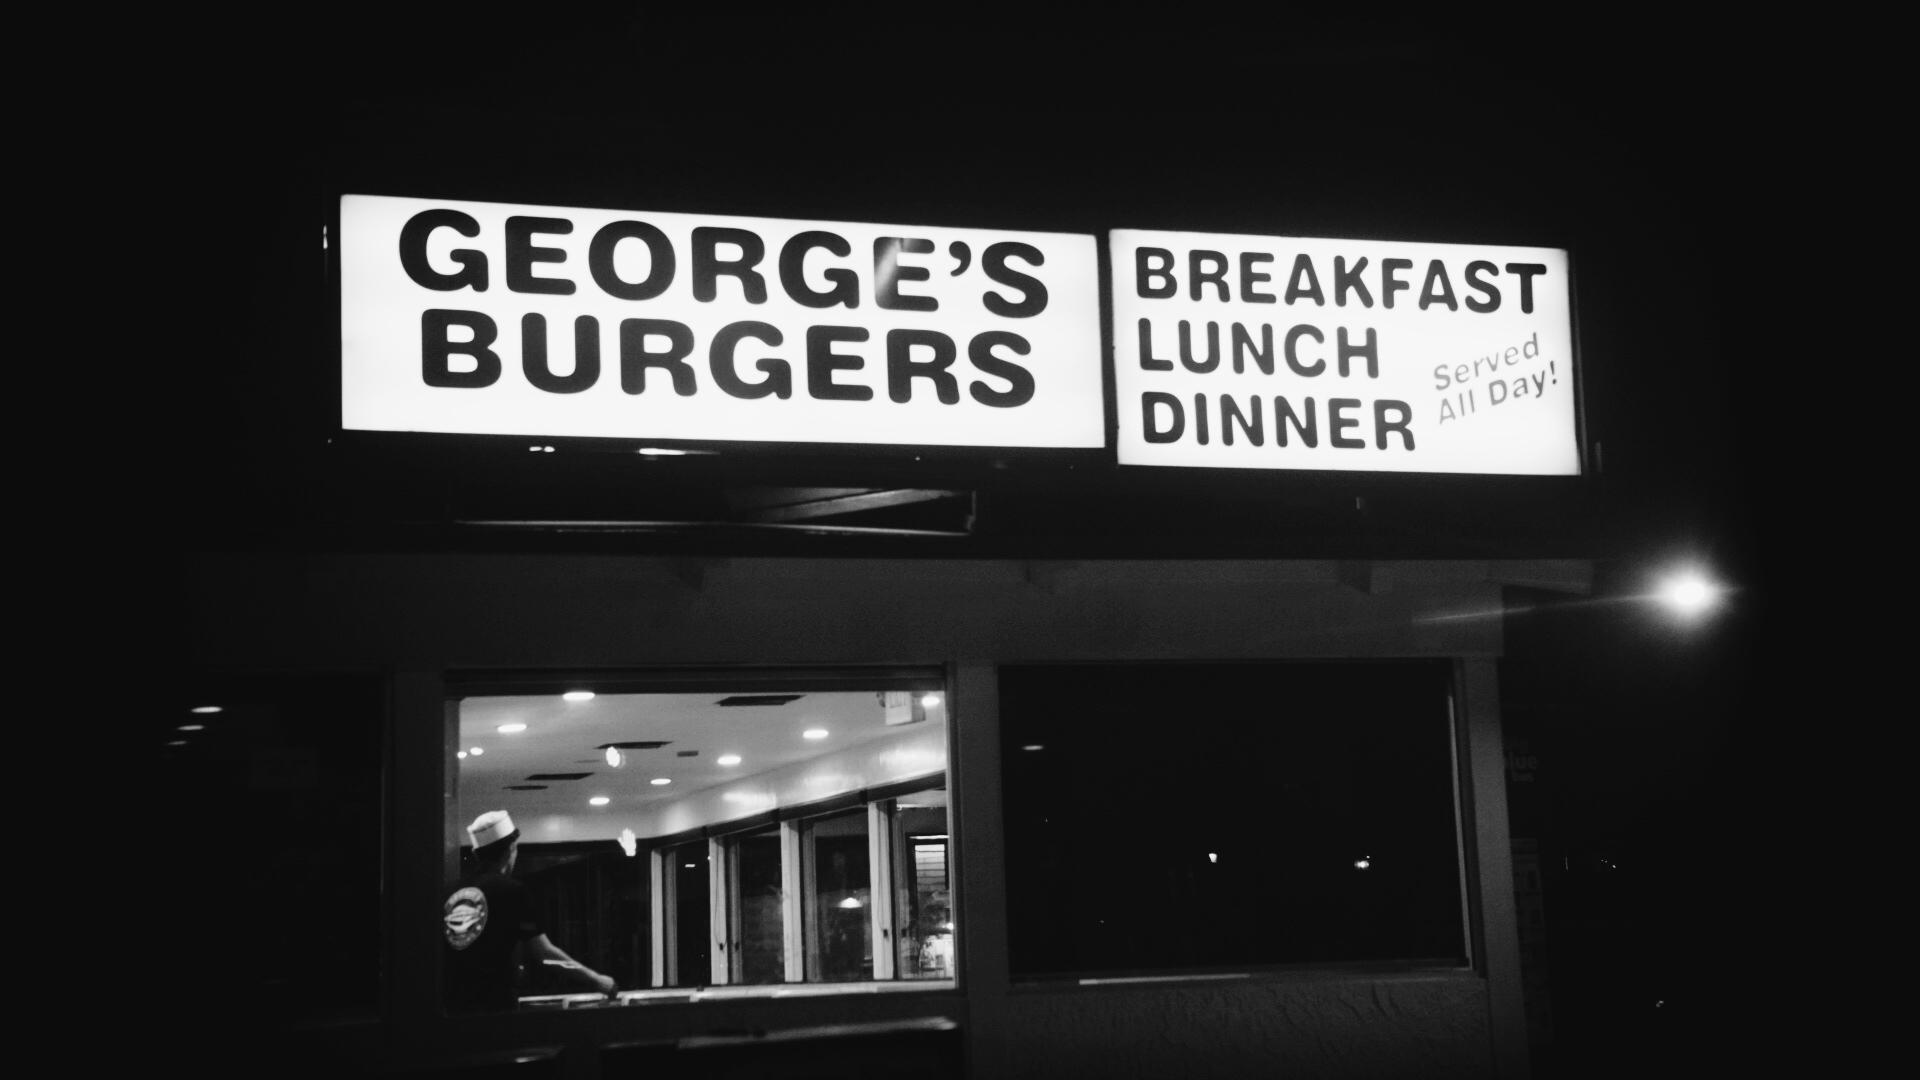 Burgers in Venice, California